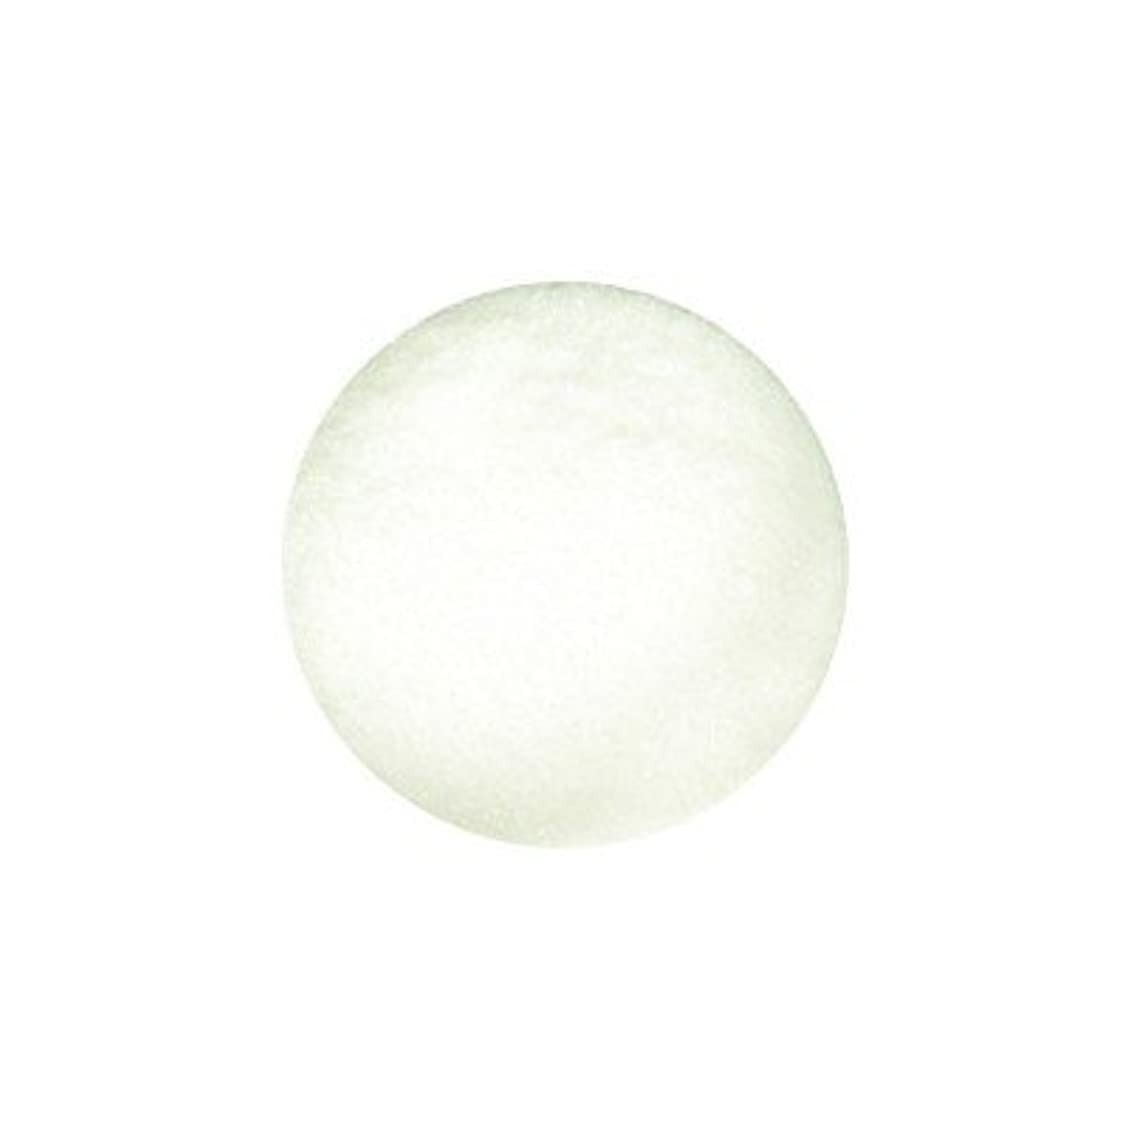 B.N クリスタリーナ ジュエルグリッター オーロラマルチ 100ミクロン CRN-13